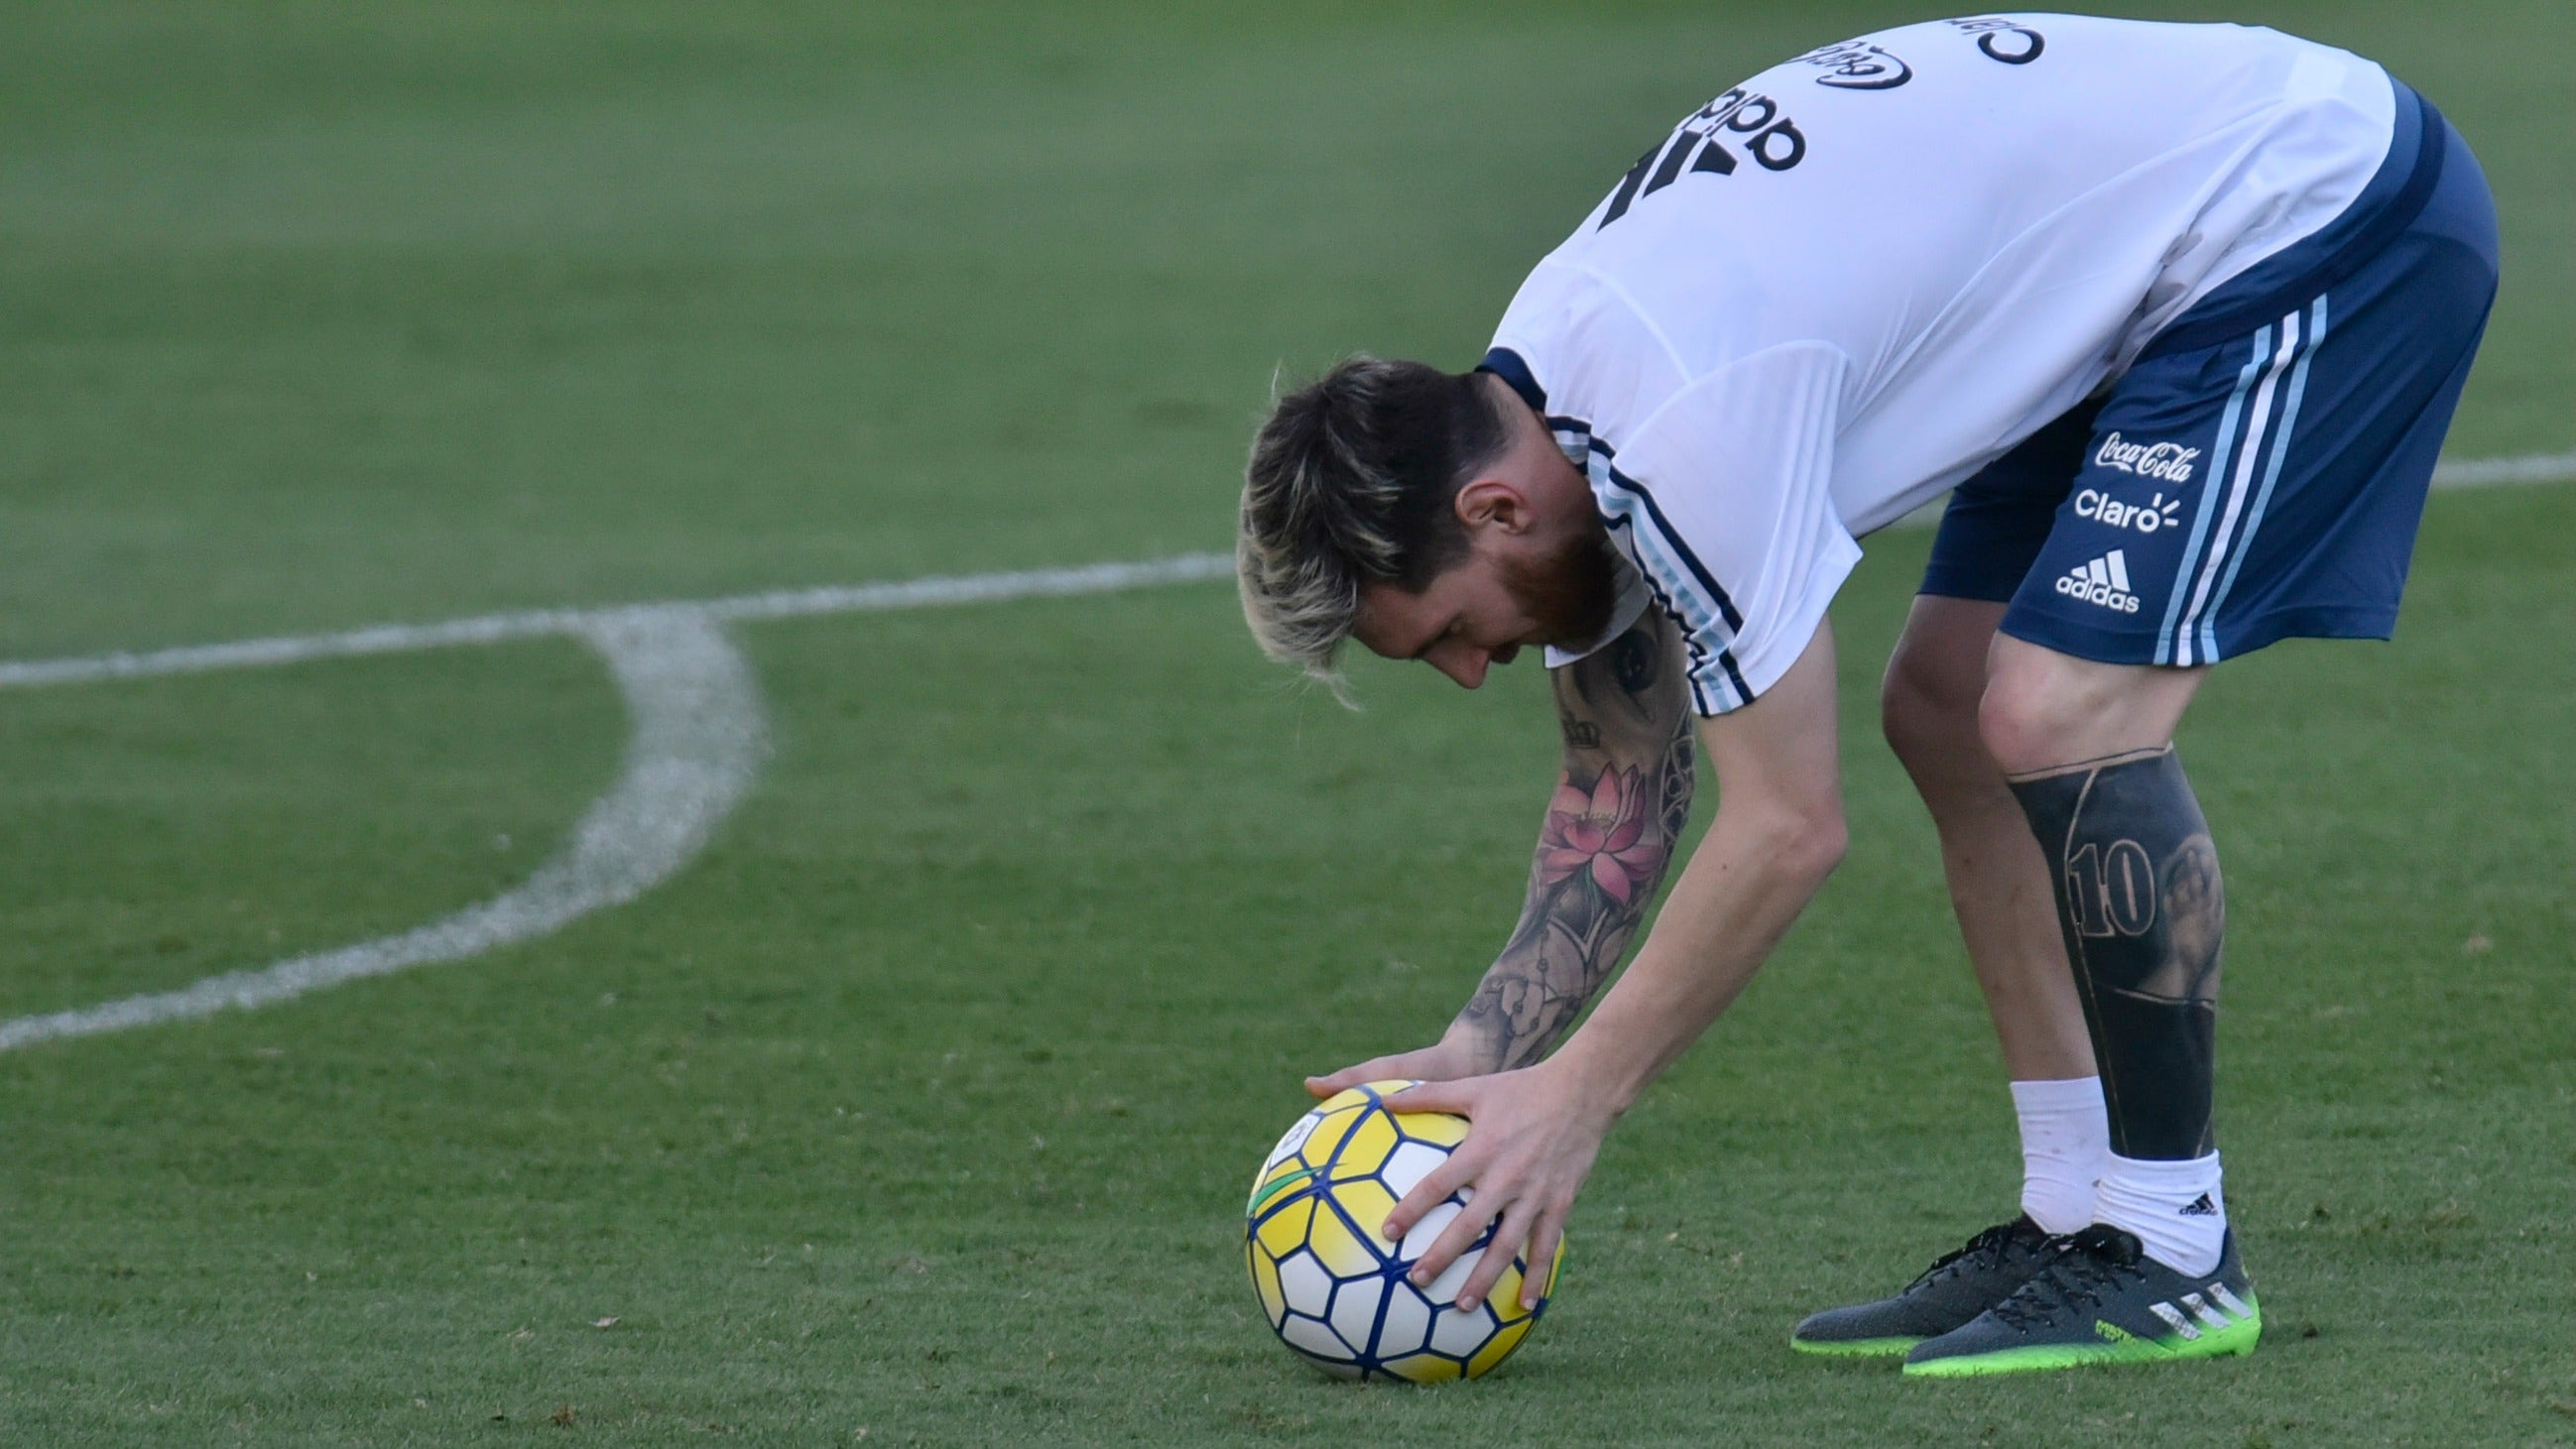 Lionel Messi Gets Inked Again Goes Full Black Leg Sleeve